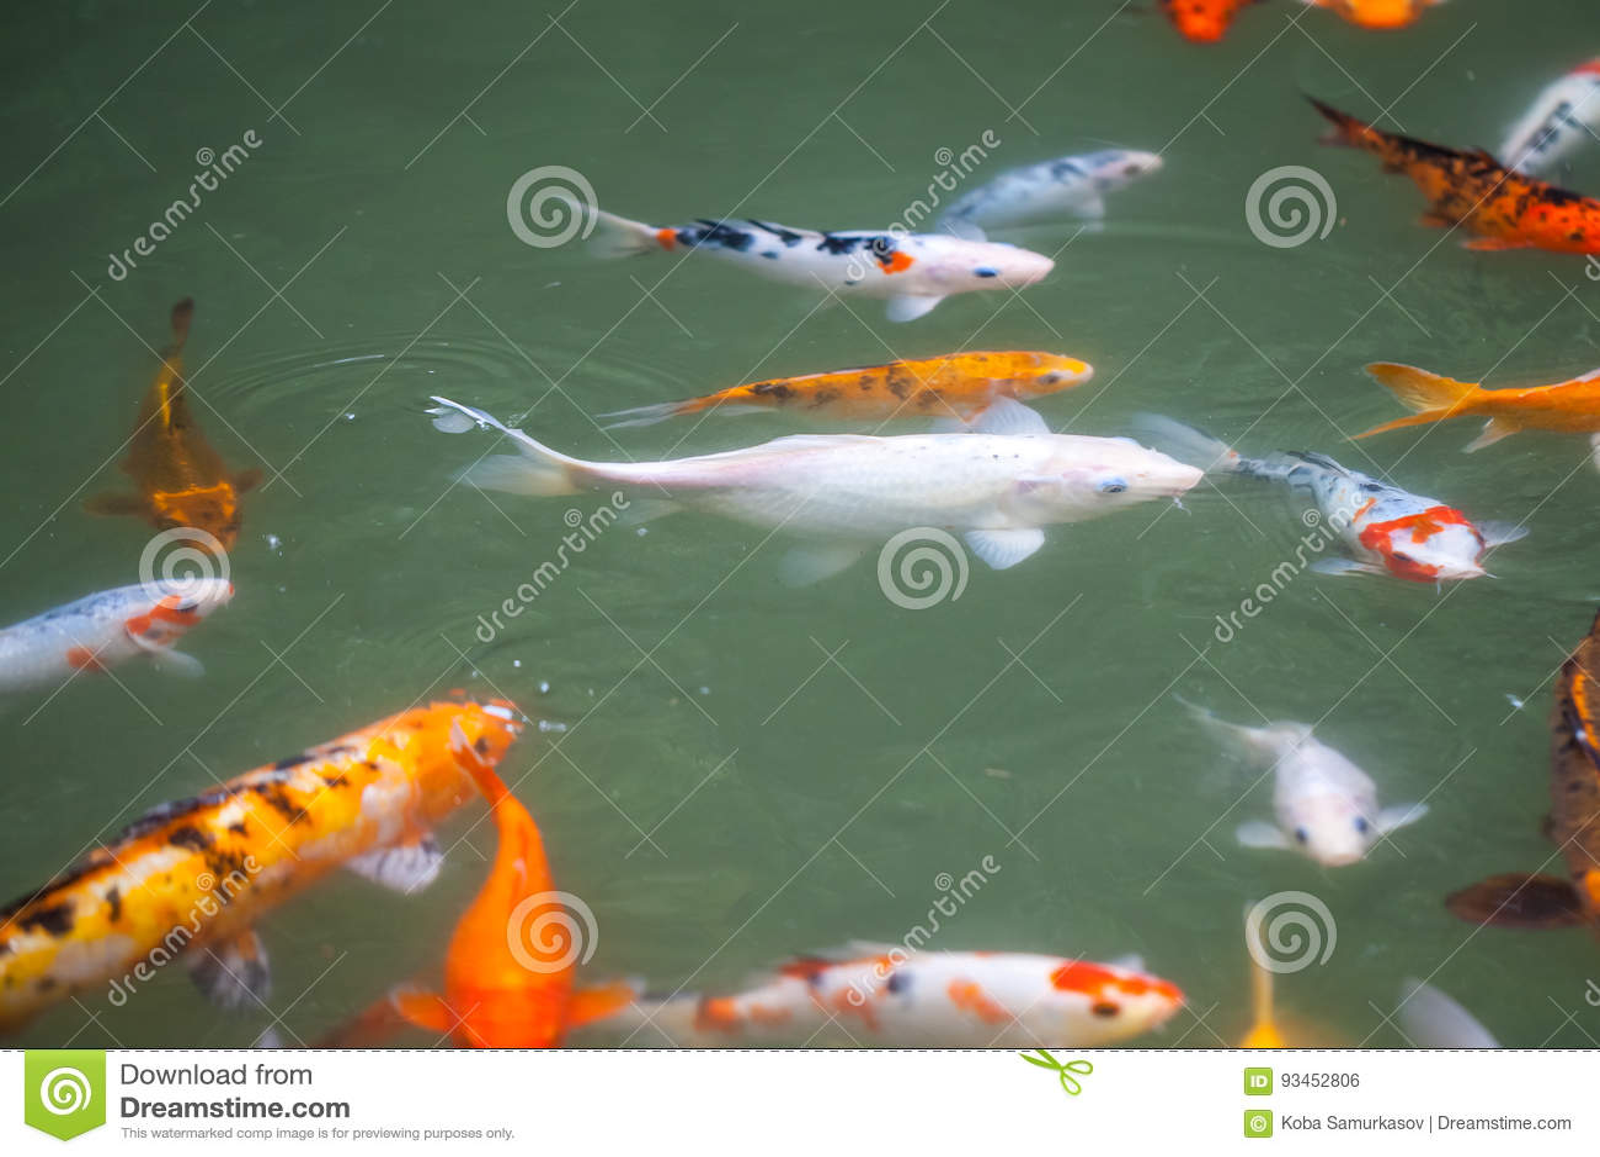 Japan Fish Call Carp Or Koi Fish Colorful, Many Fishes Many Colo ...